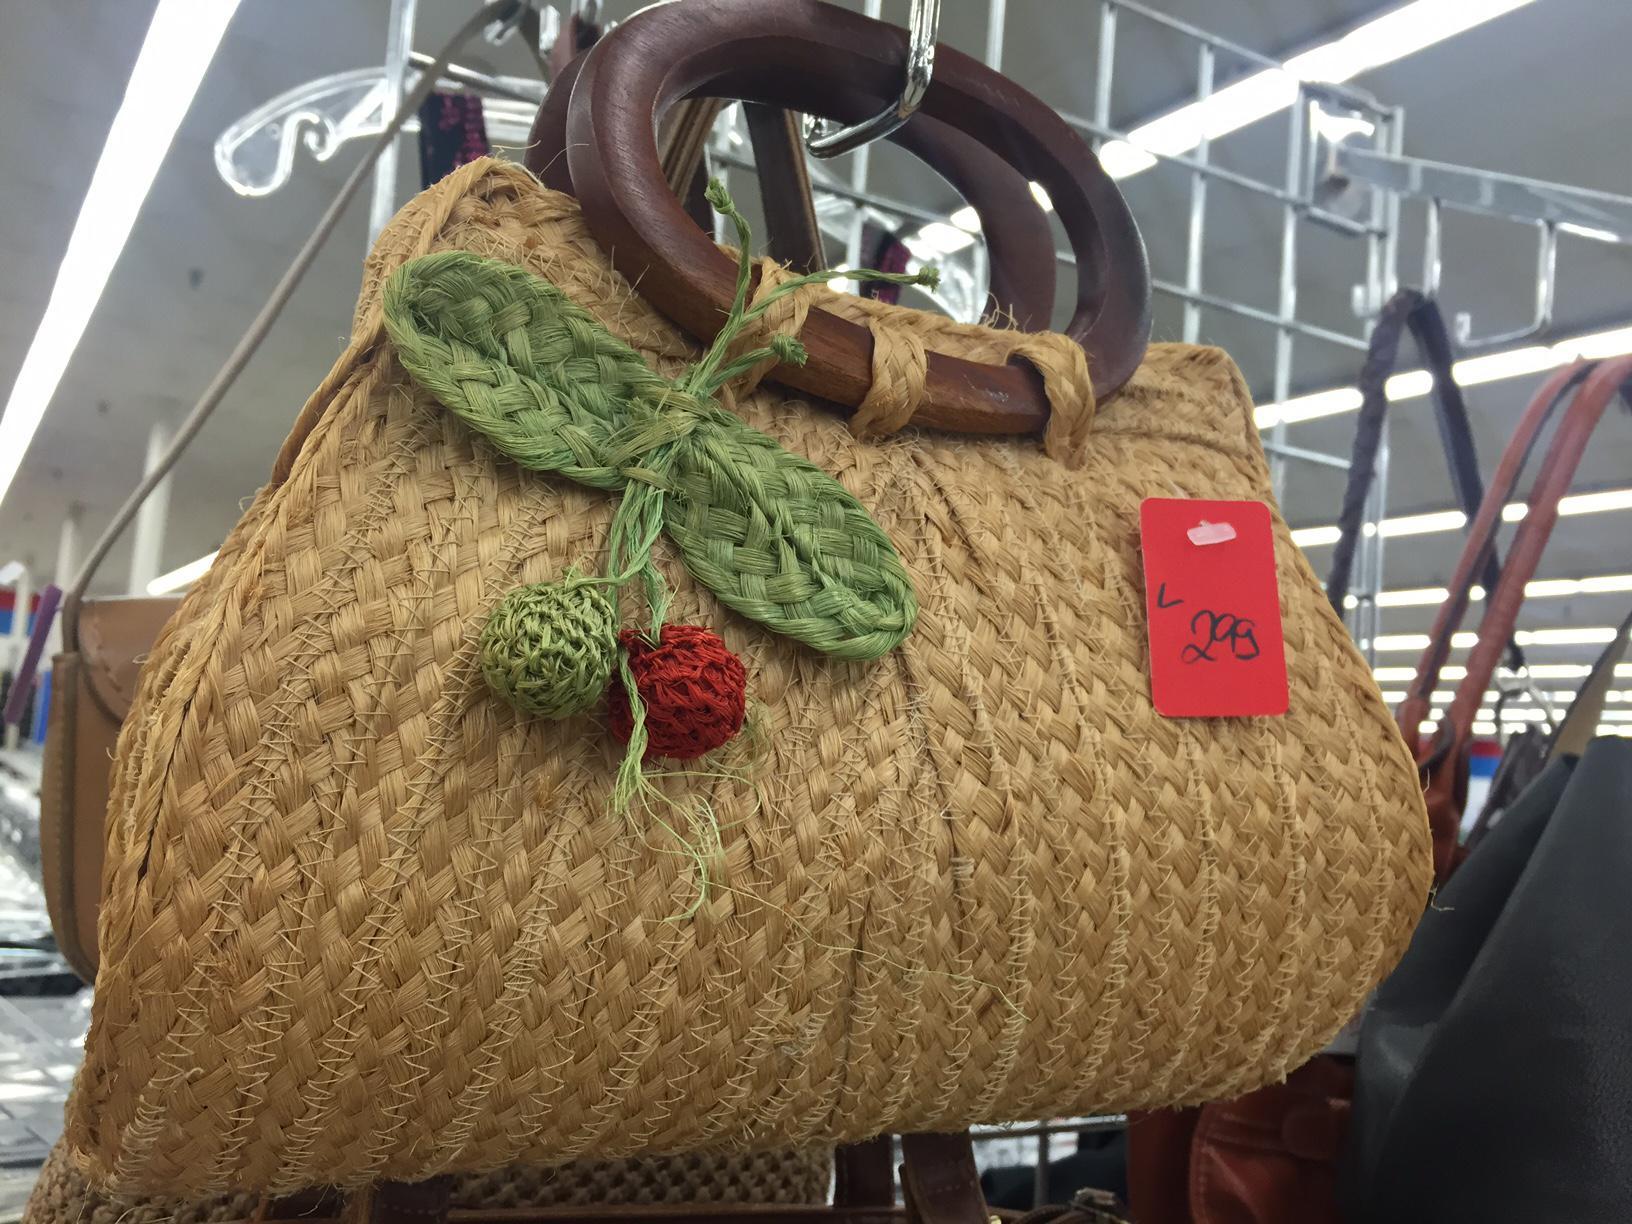 statement handbag thrift store purse for spring